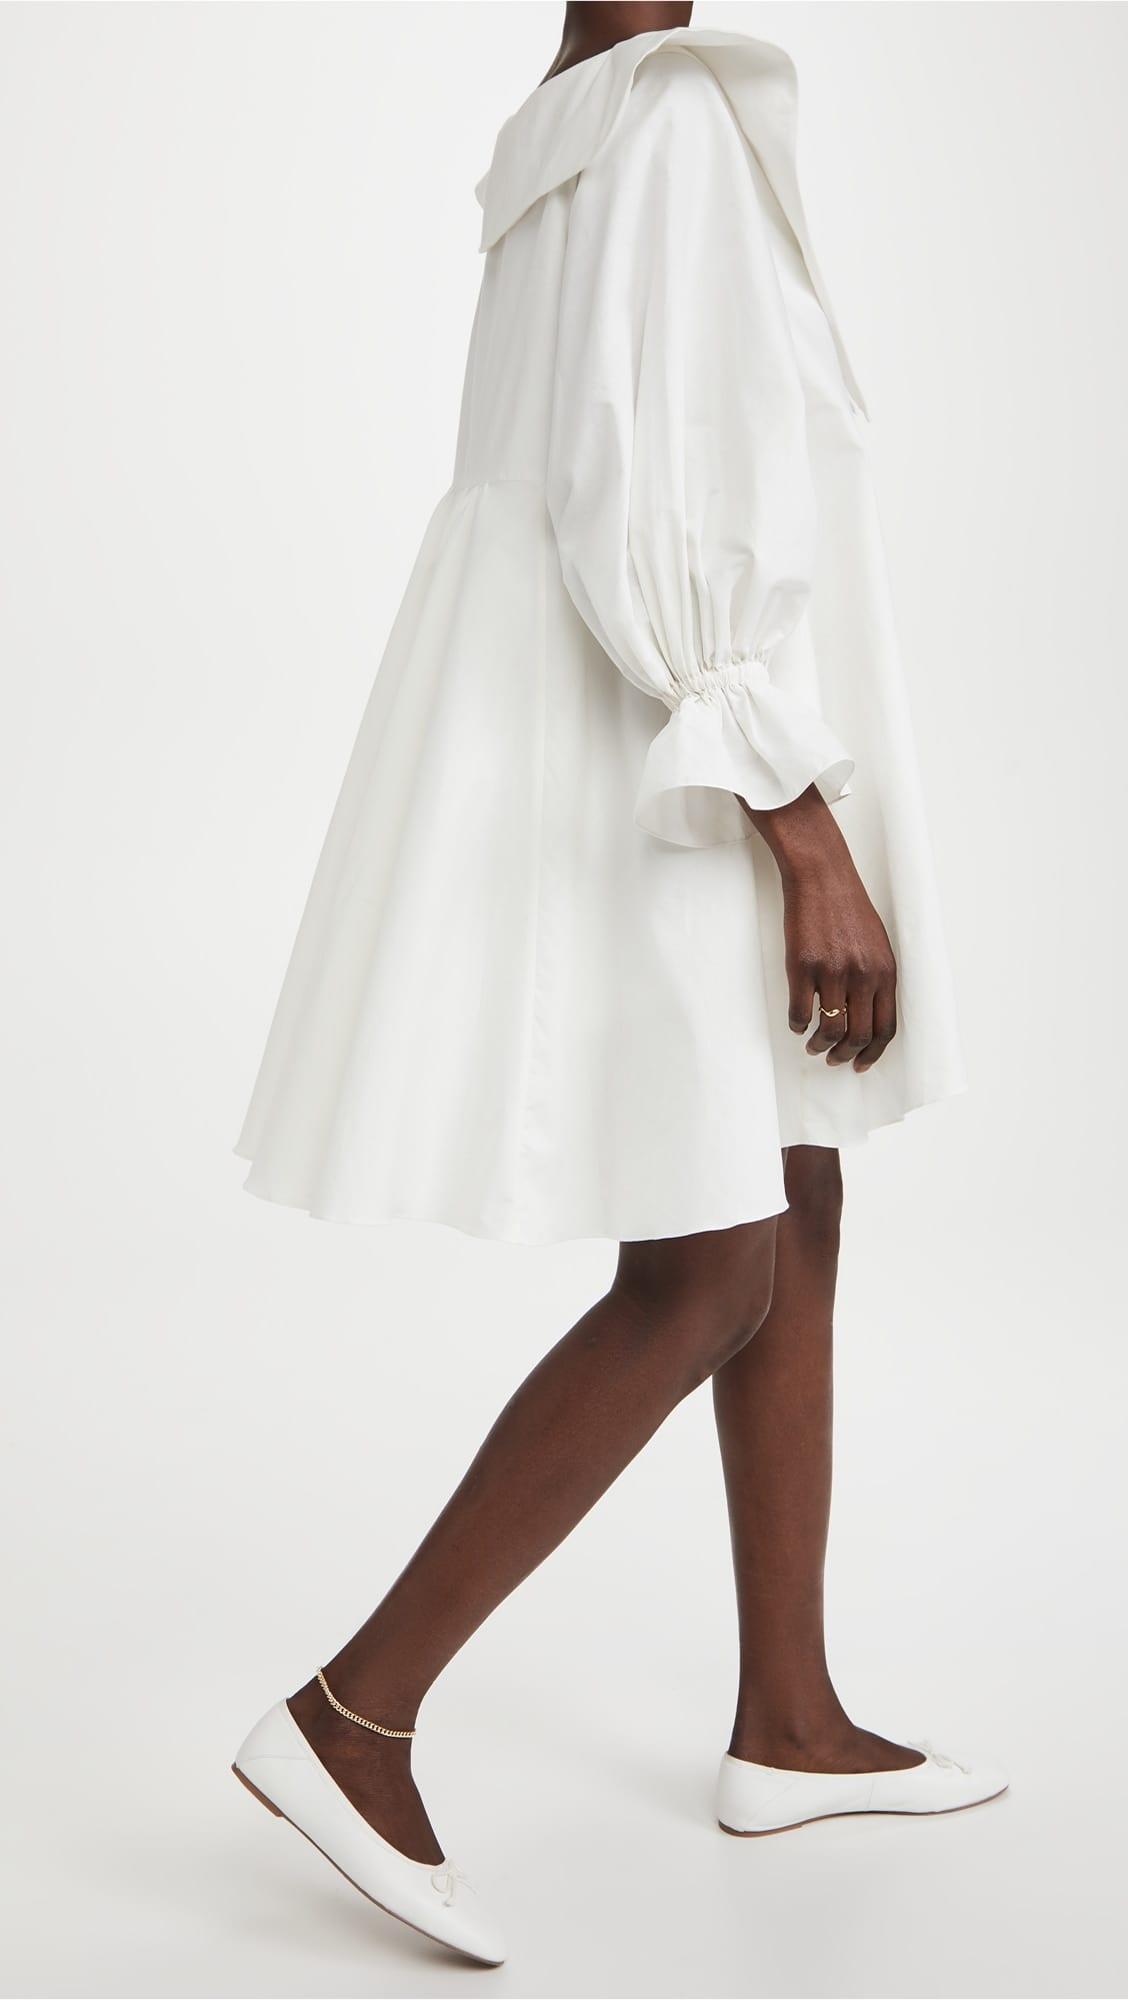 MUICHES Deep V-Neck Loose Mini Dress Woman Casual Lantern Sleeve High Waist Sweet Dress 2021 New Fashion Exaggerated Design